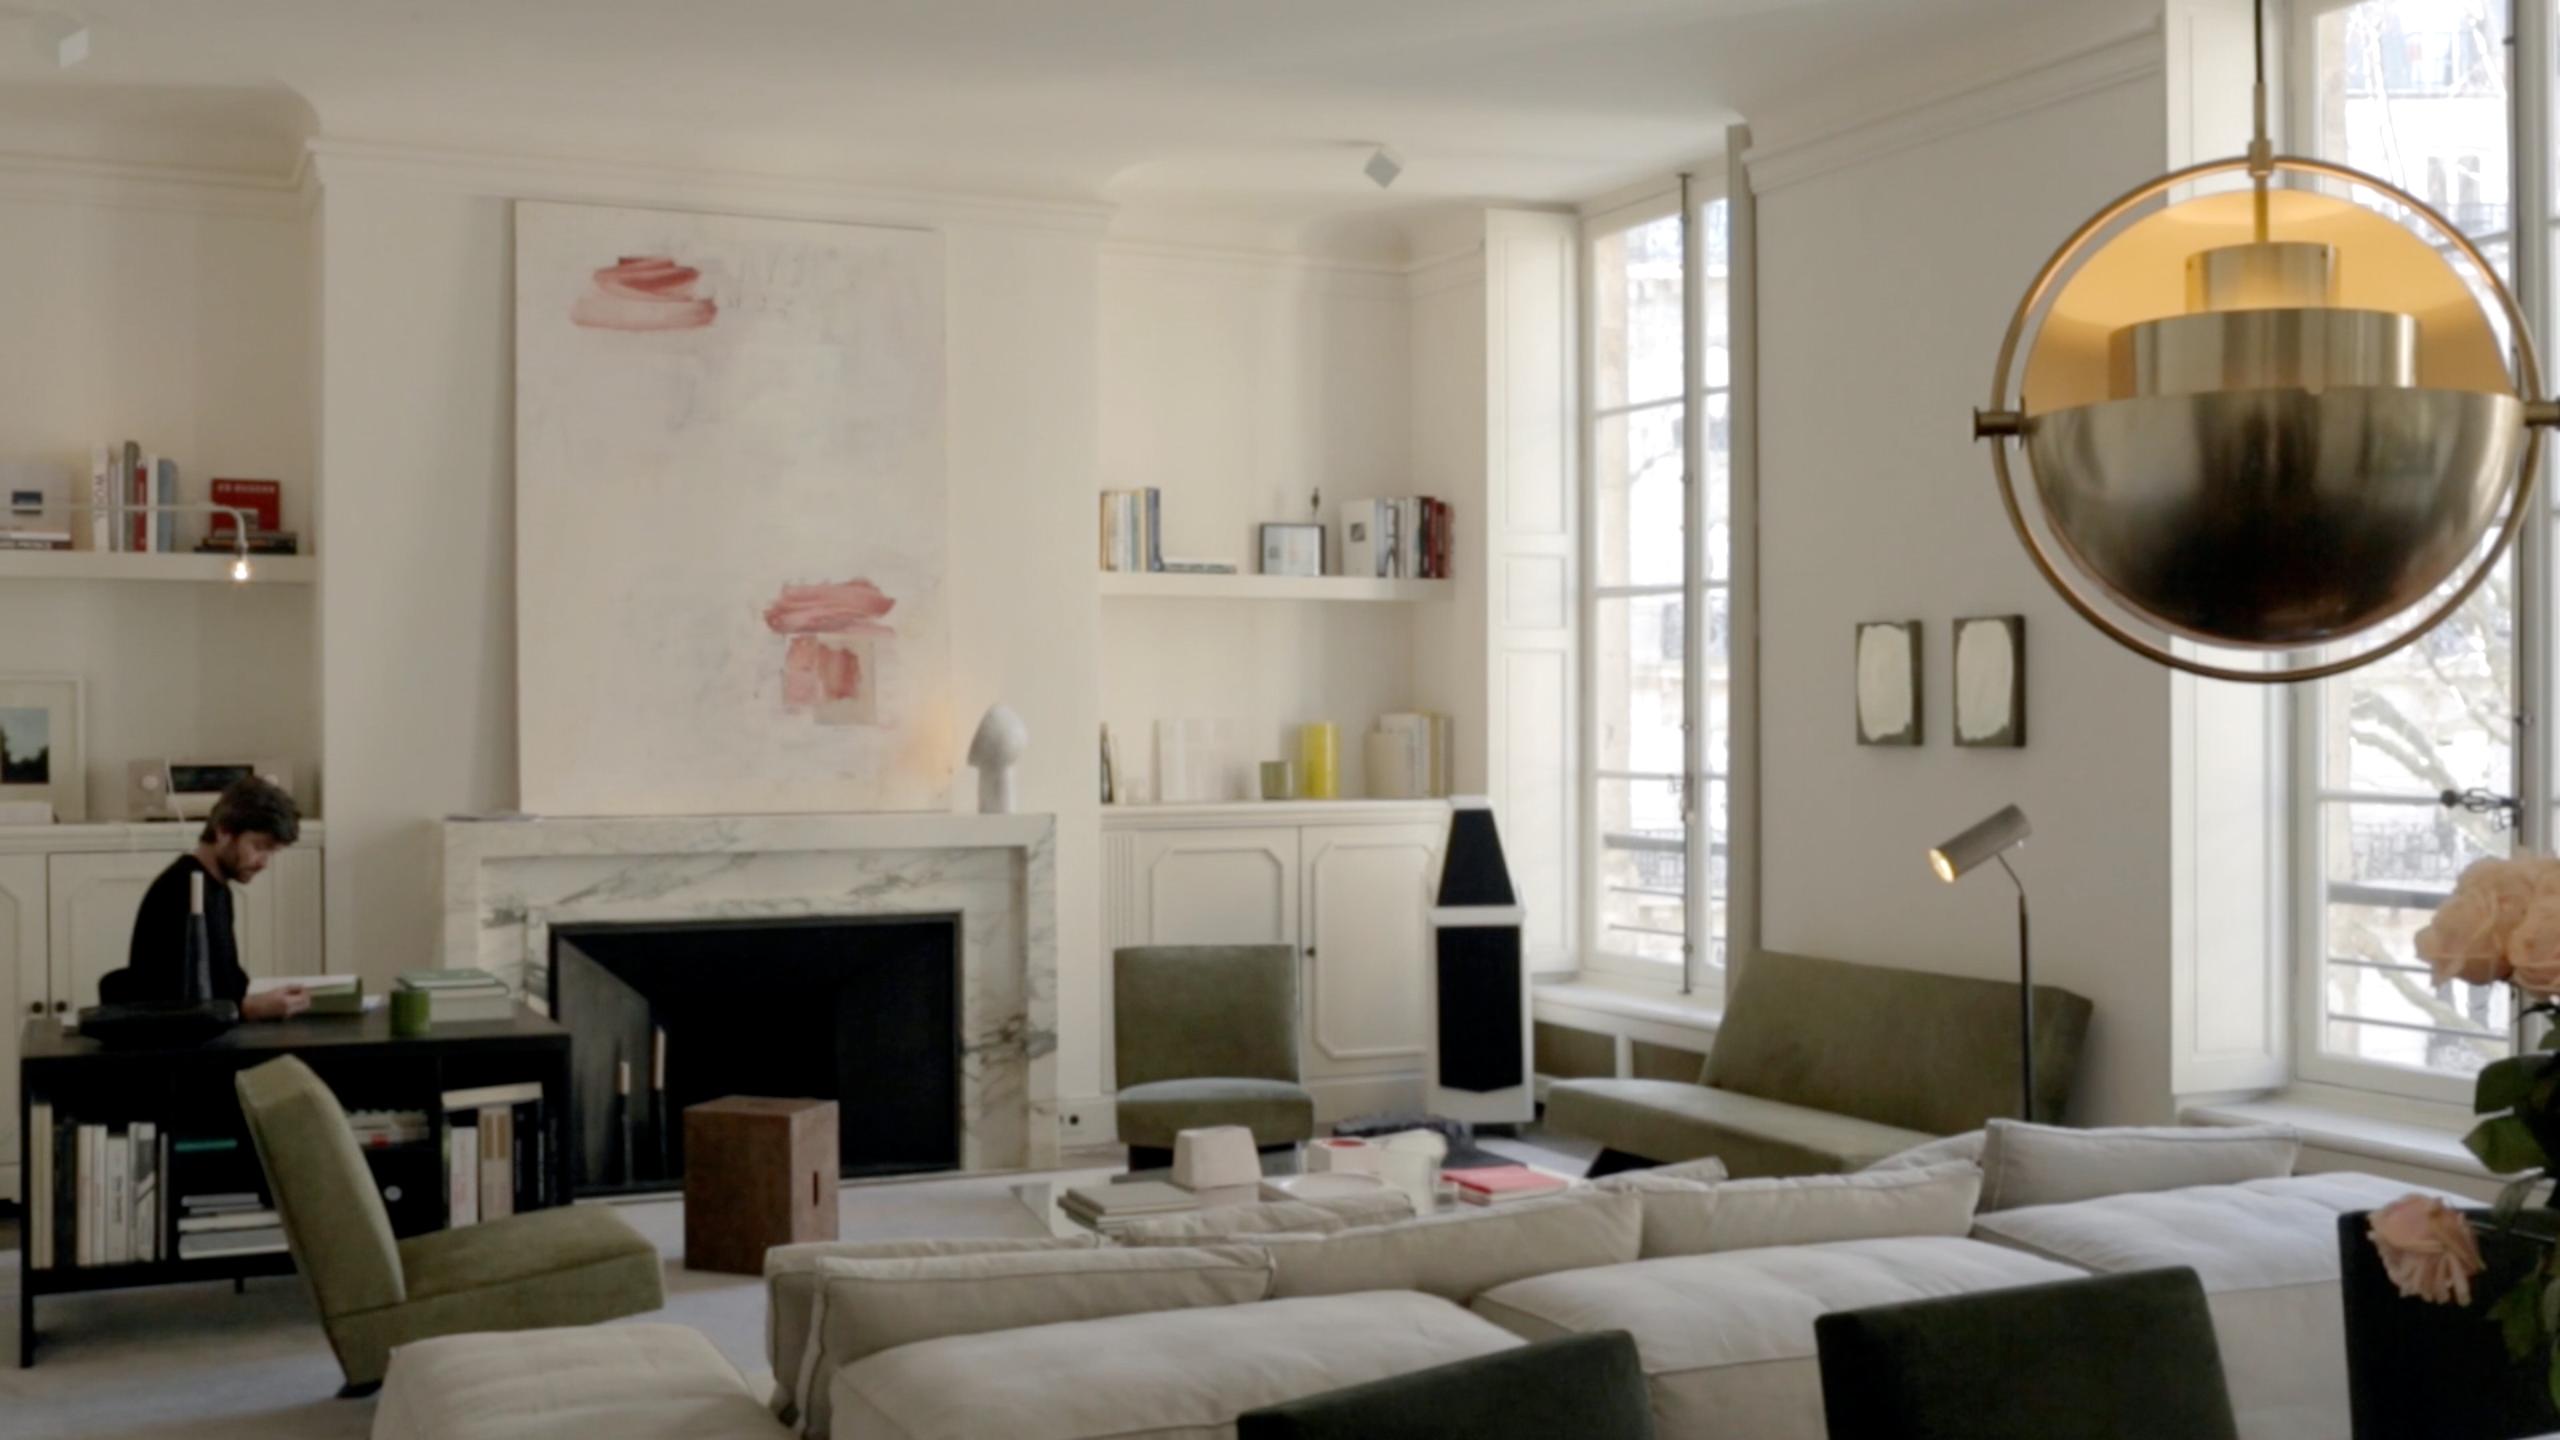 Step Inside The Parisian Home Of Jean Touitou, A.P.C